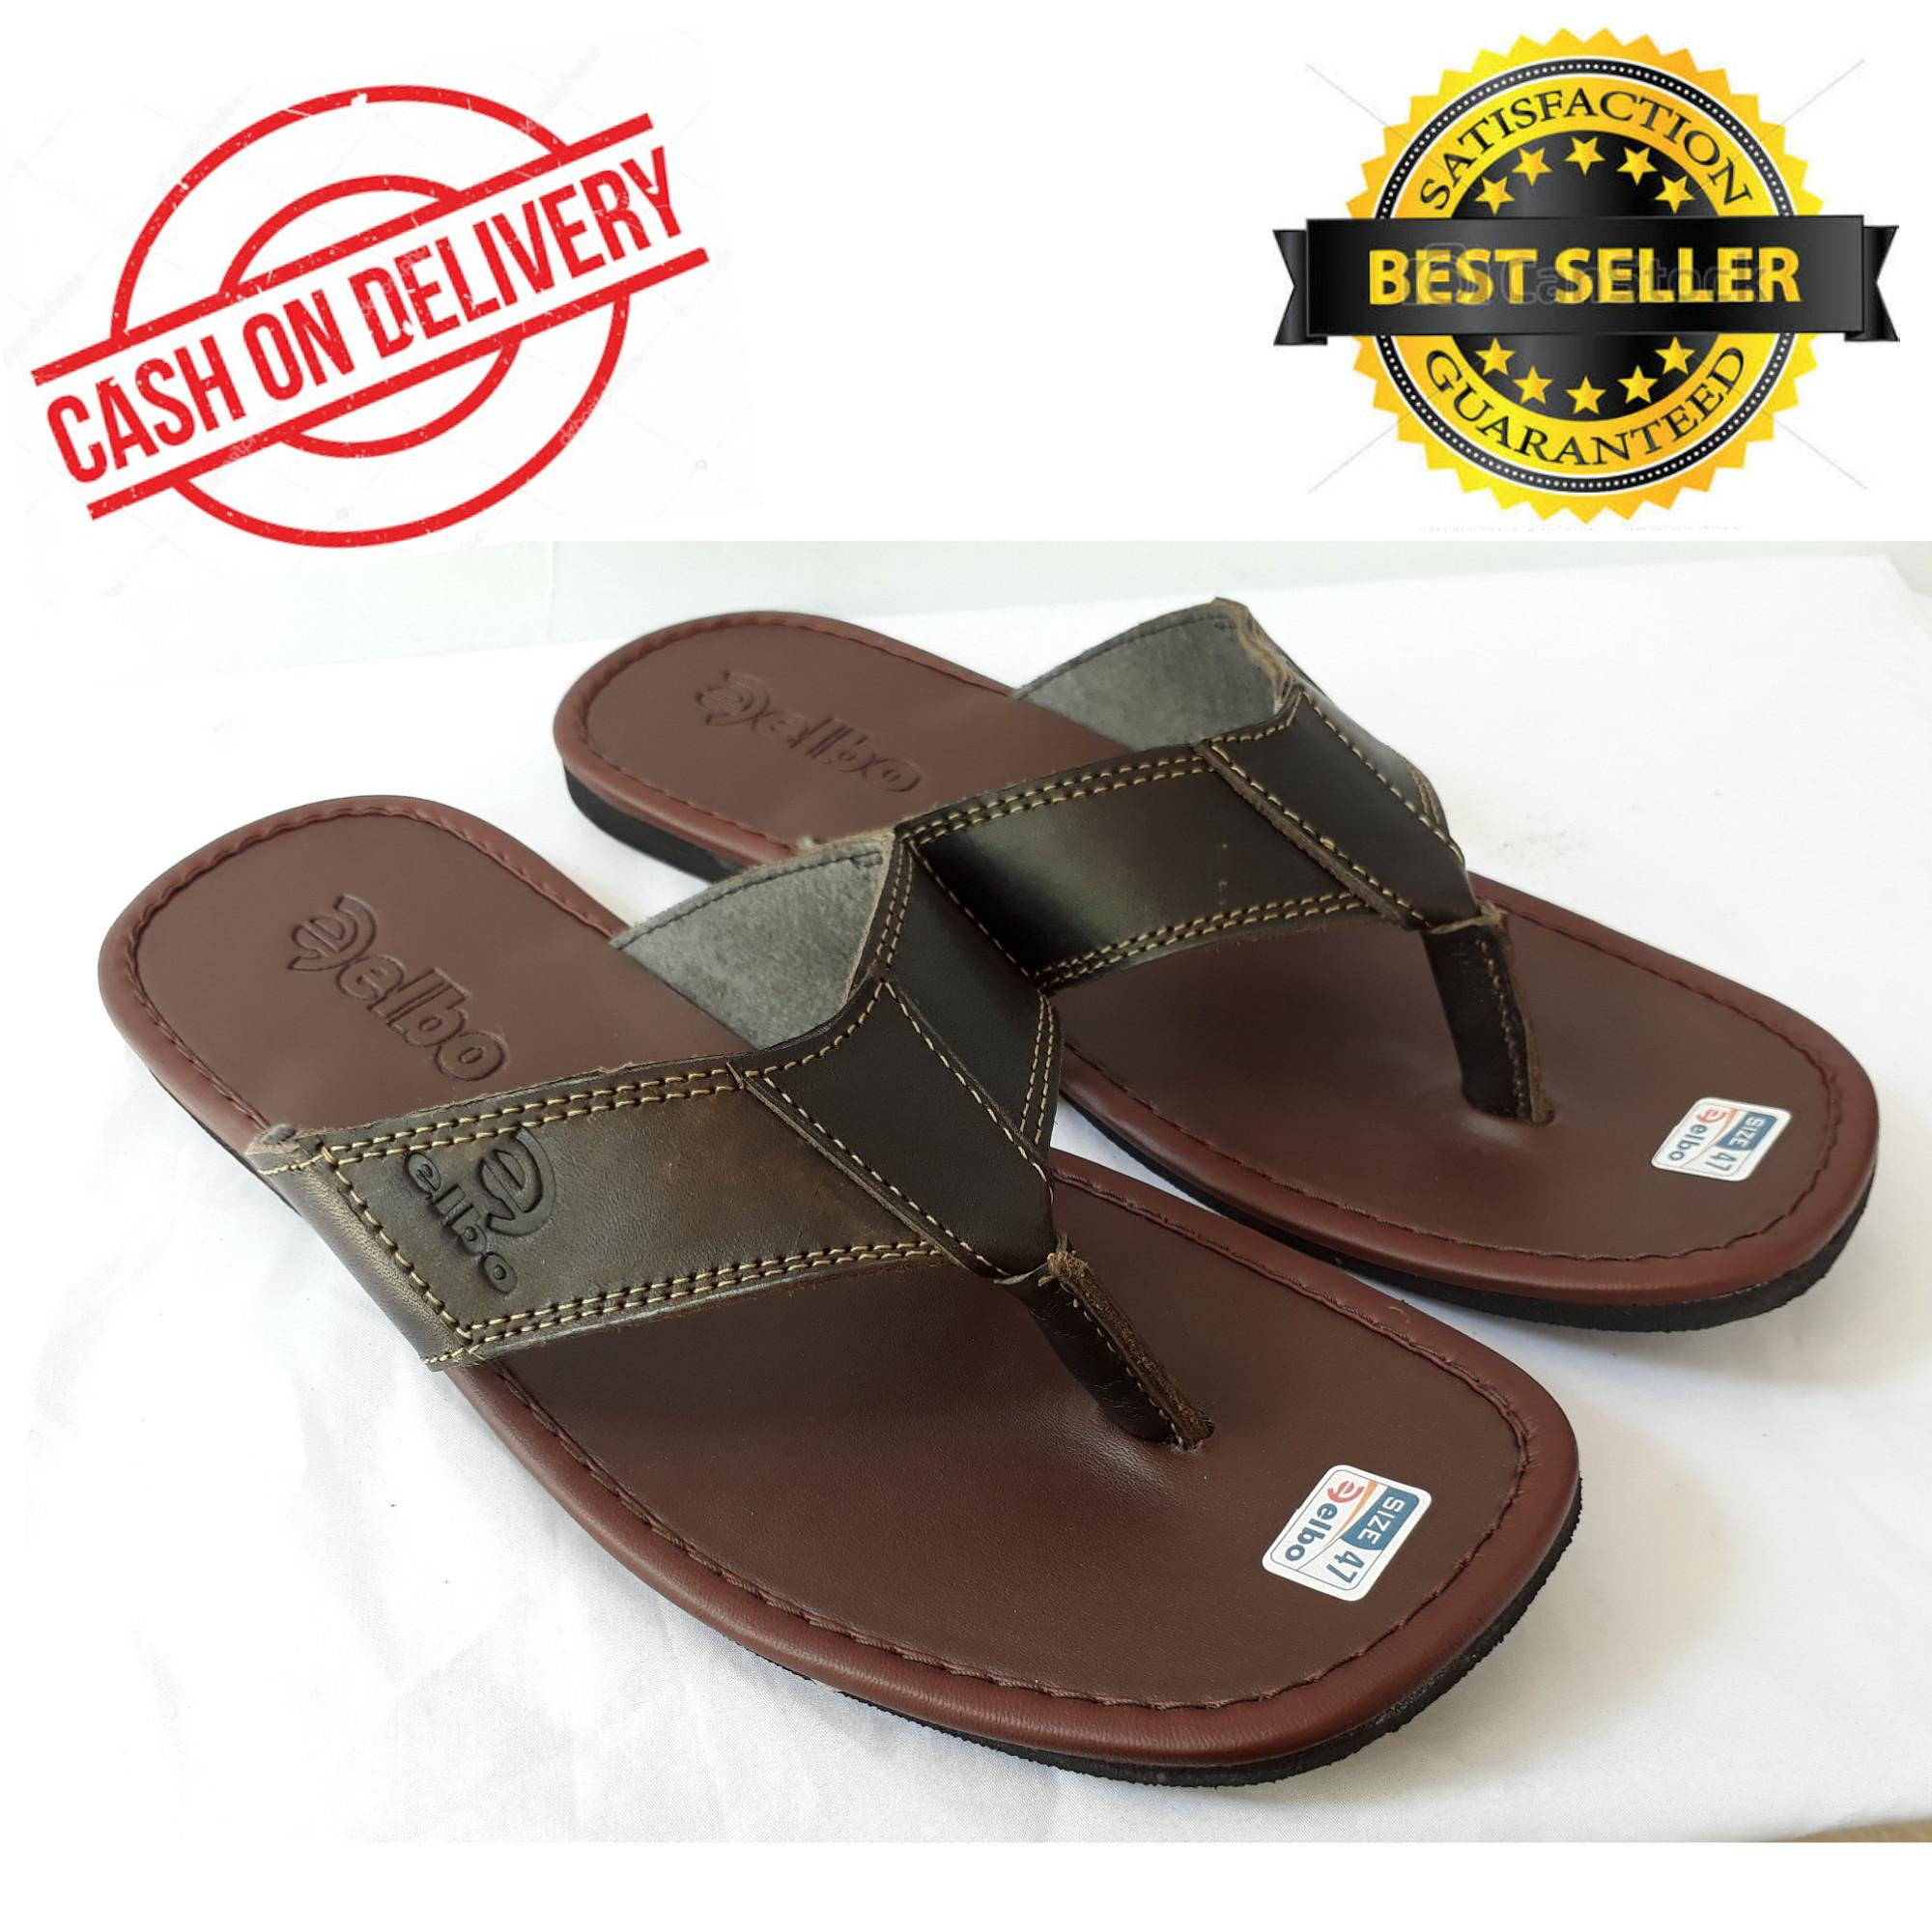 Sandal Pria Japit Jumbo Sandal BIG SIZE 44 47 Casual elbo Coklat